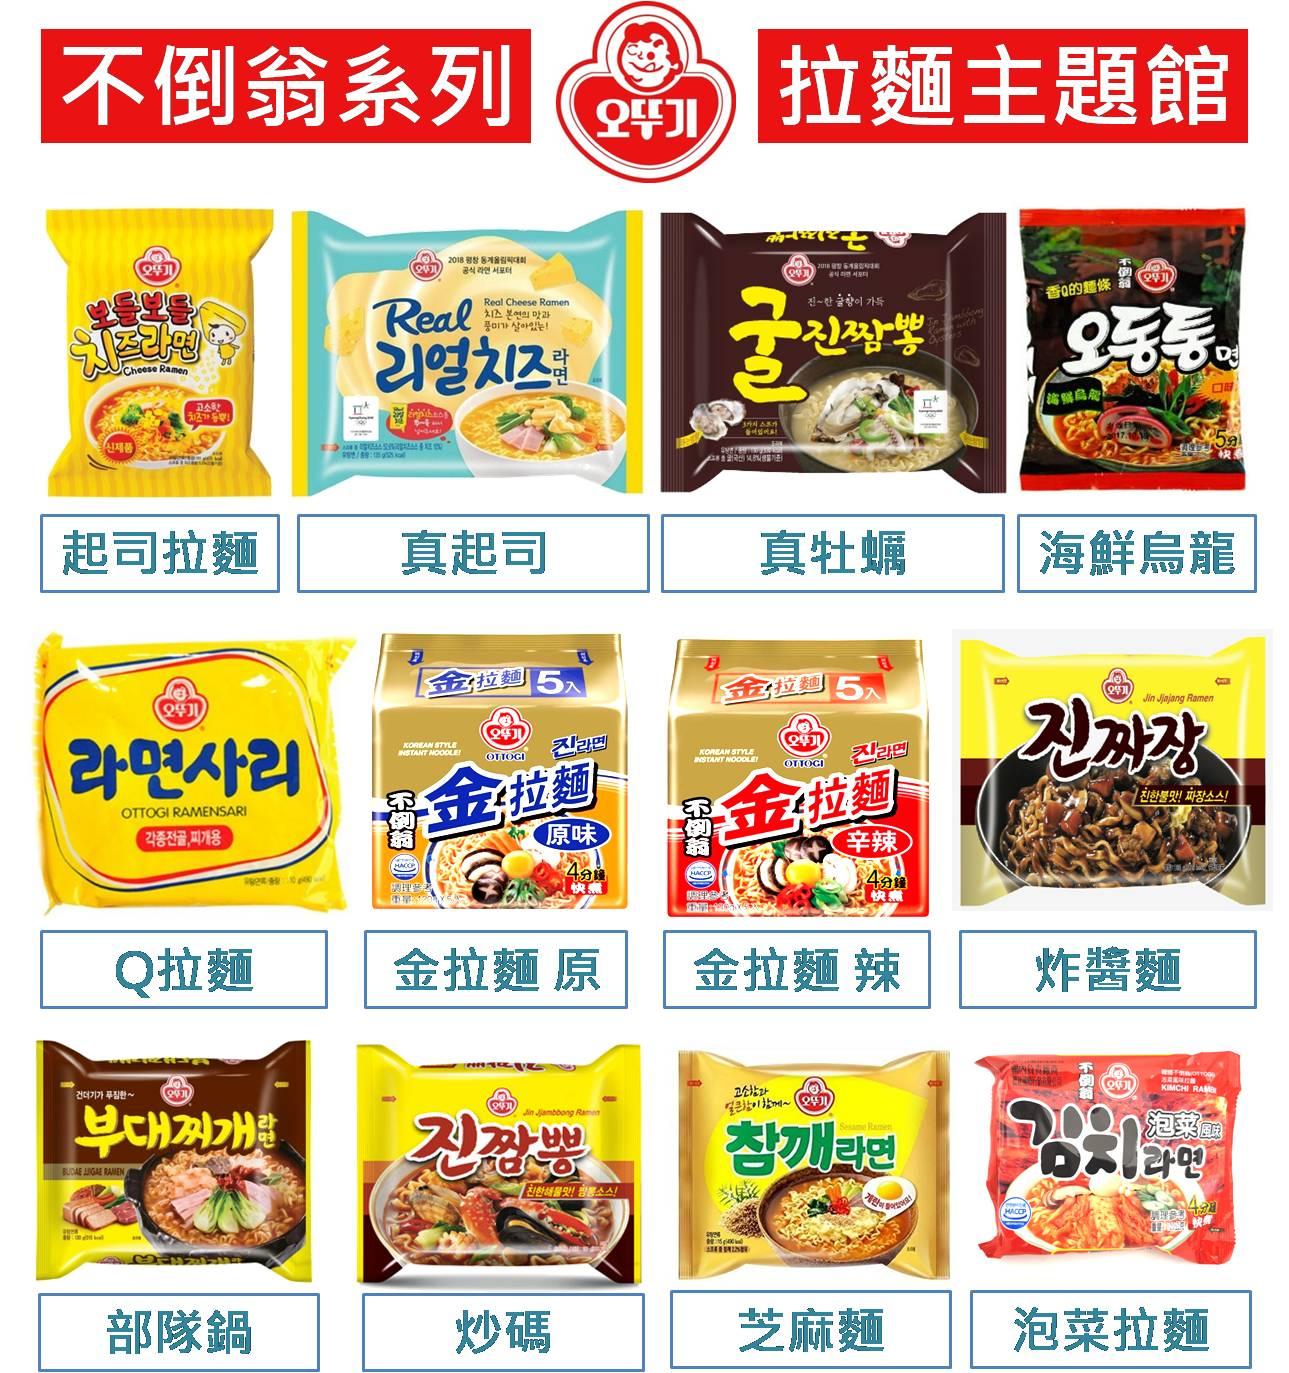 《Chara 微百貨》韓國 不倒翁 炸醬 Q 真起司 螃蟹 炒碼 芝麻麵 部隊鍋 金拉麵 起司 拉麵 烏龍 牡蠣 泡菜